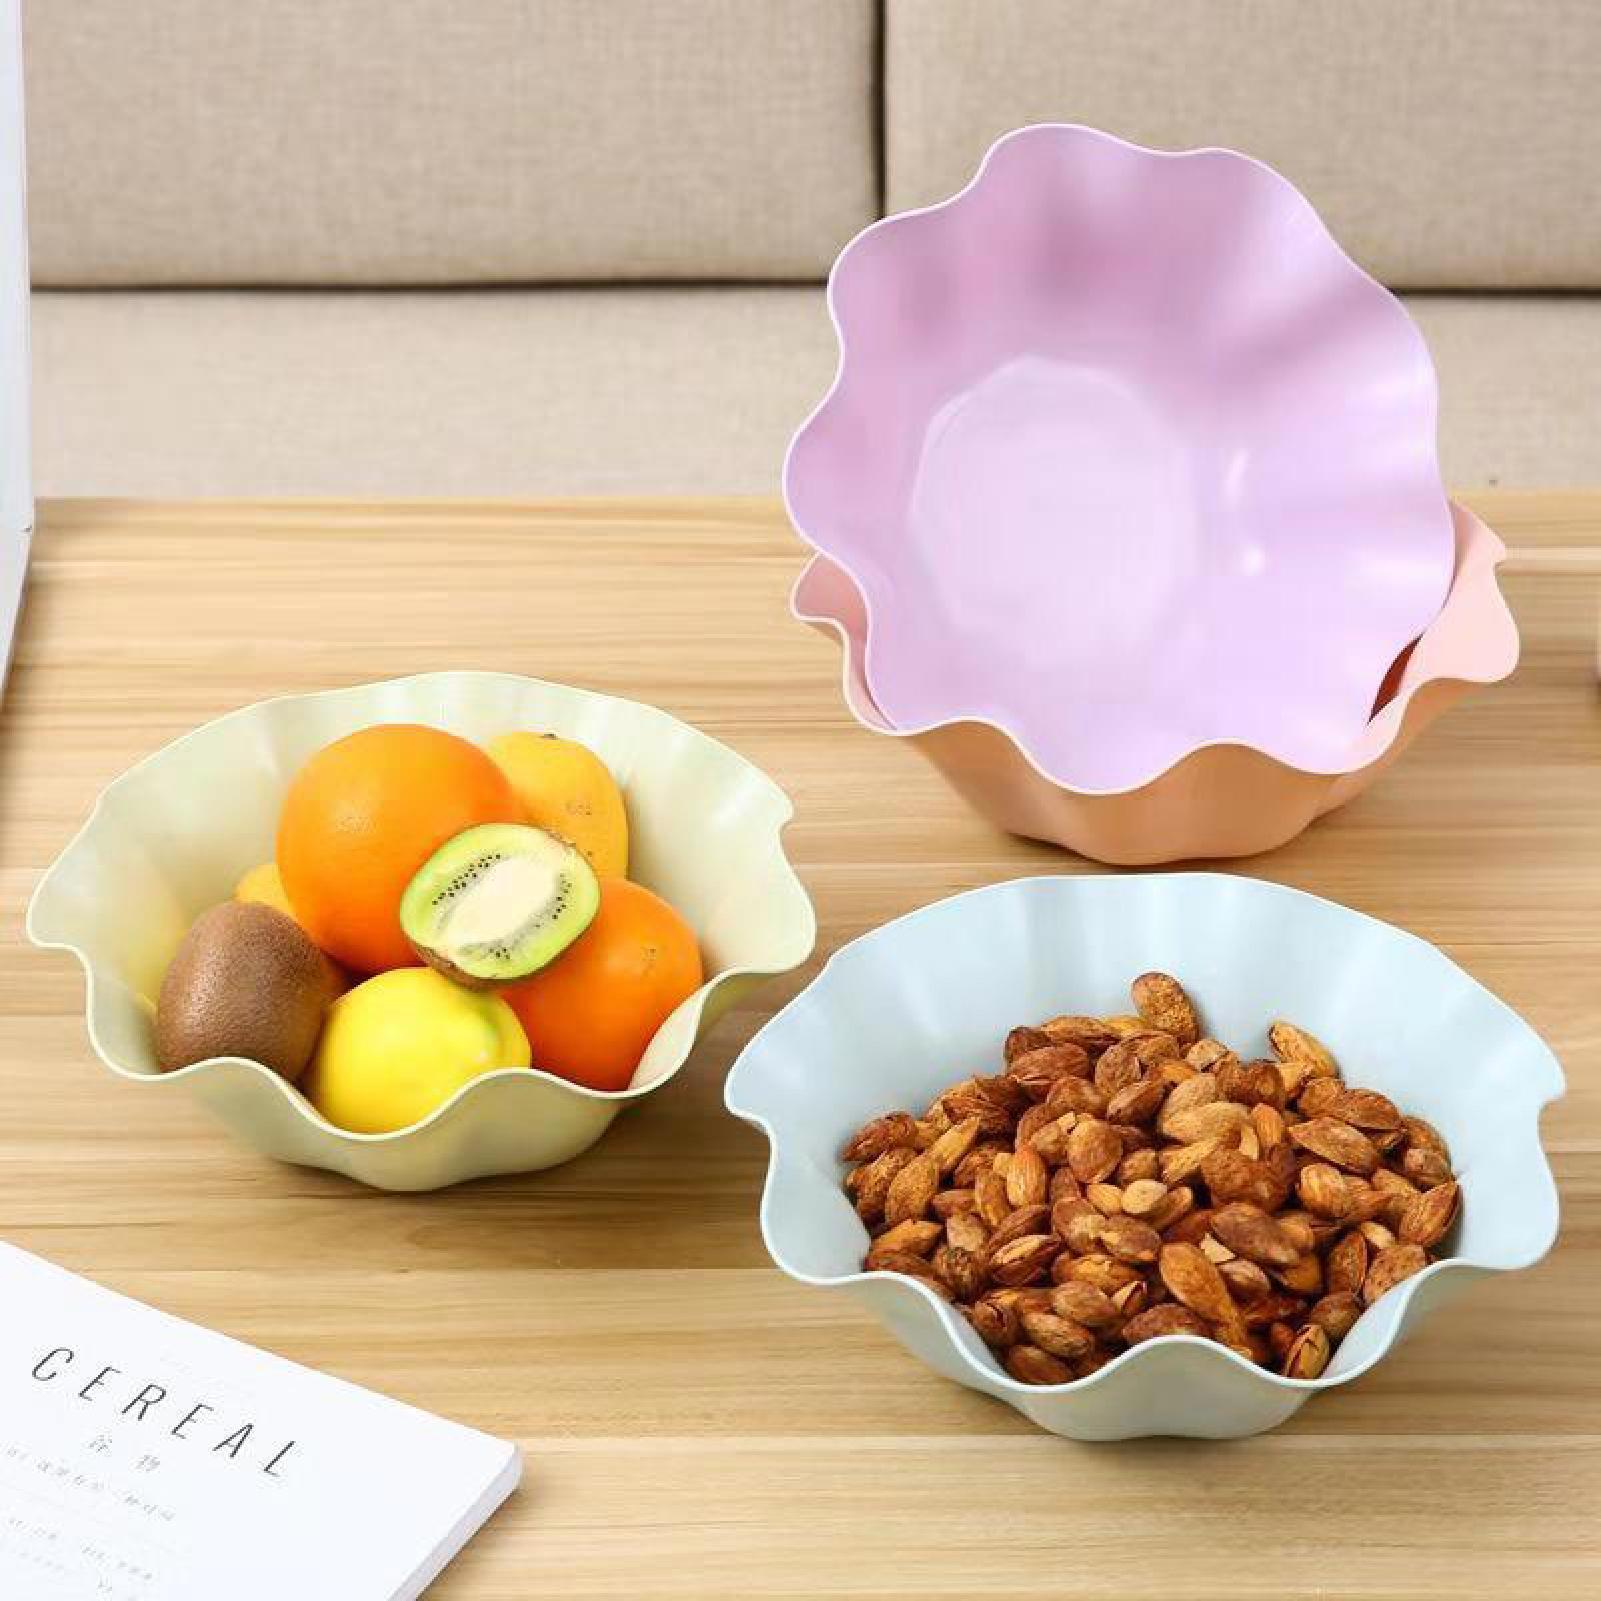 Nordic Style Living Room Lotus Leaf Nut Plate Office Desktop Fruit Snake Storage Tray